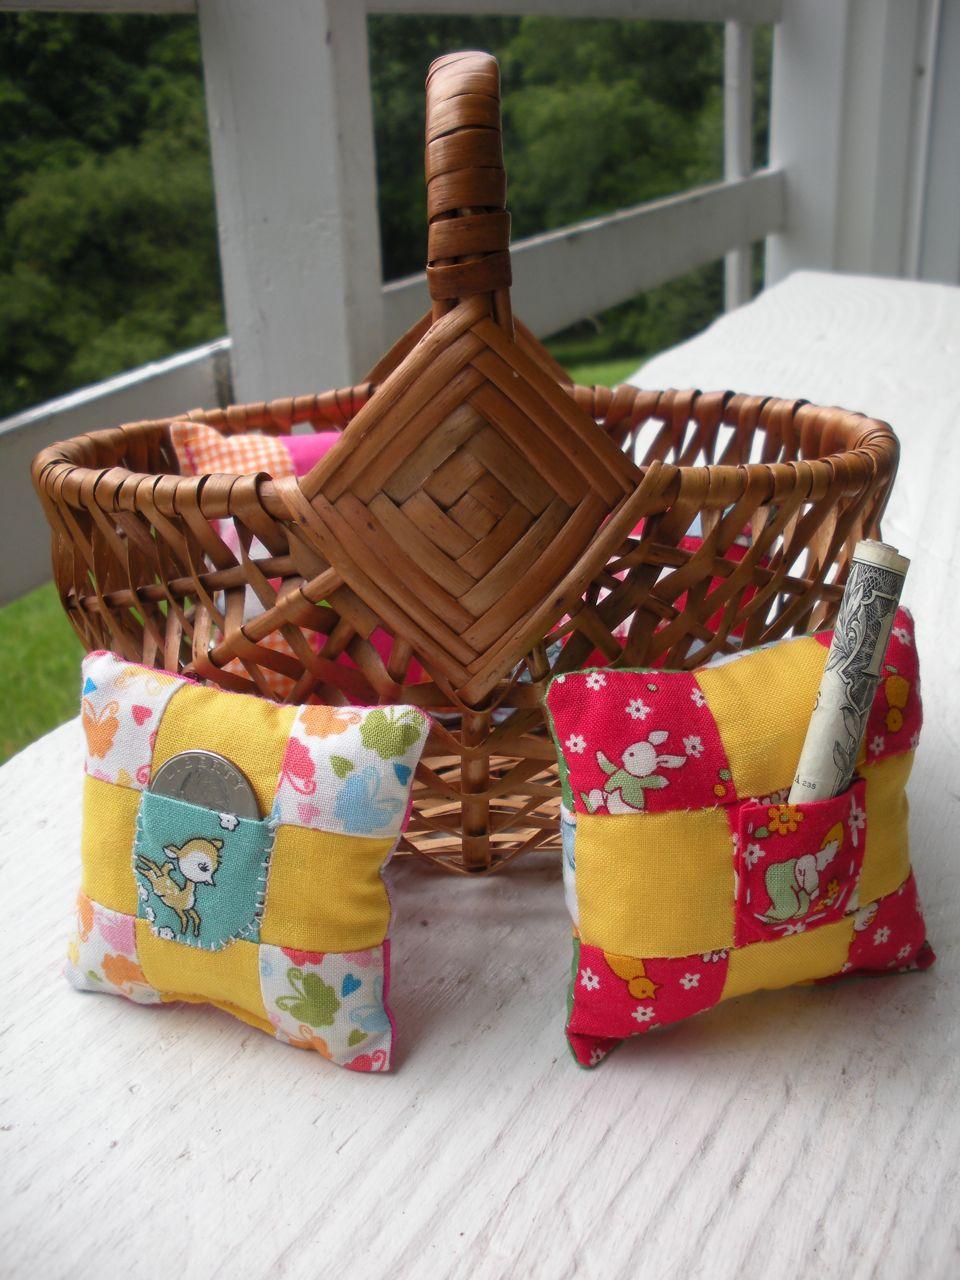 Toothfairy Pillows3